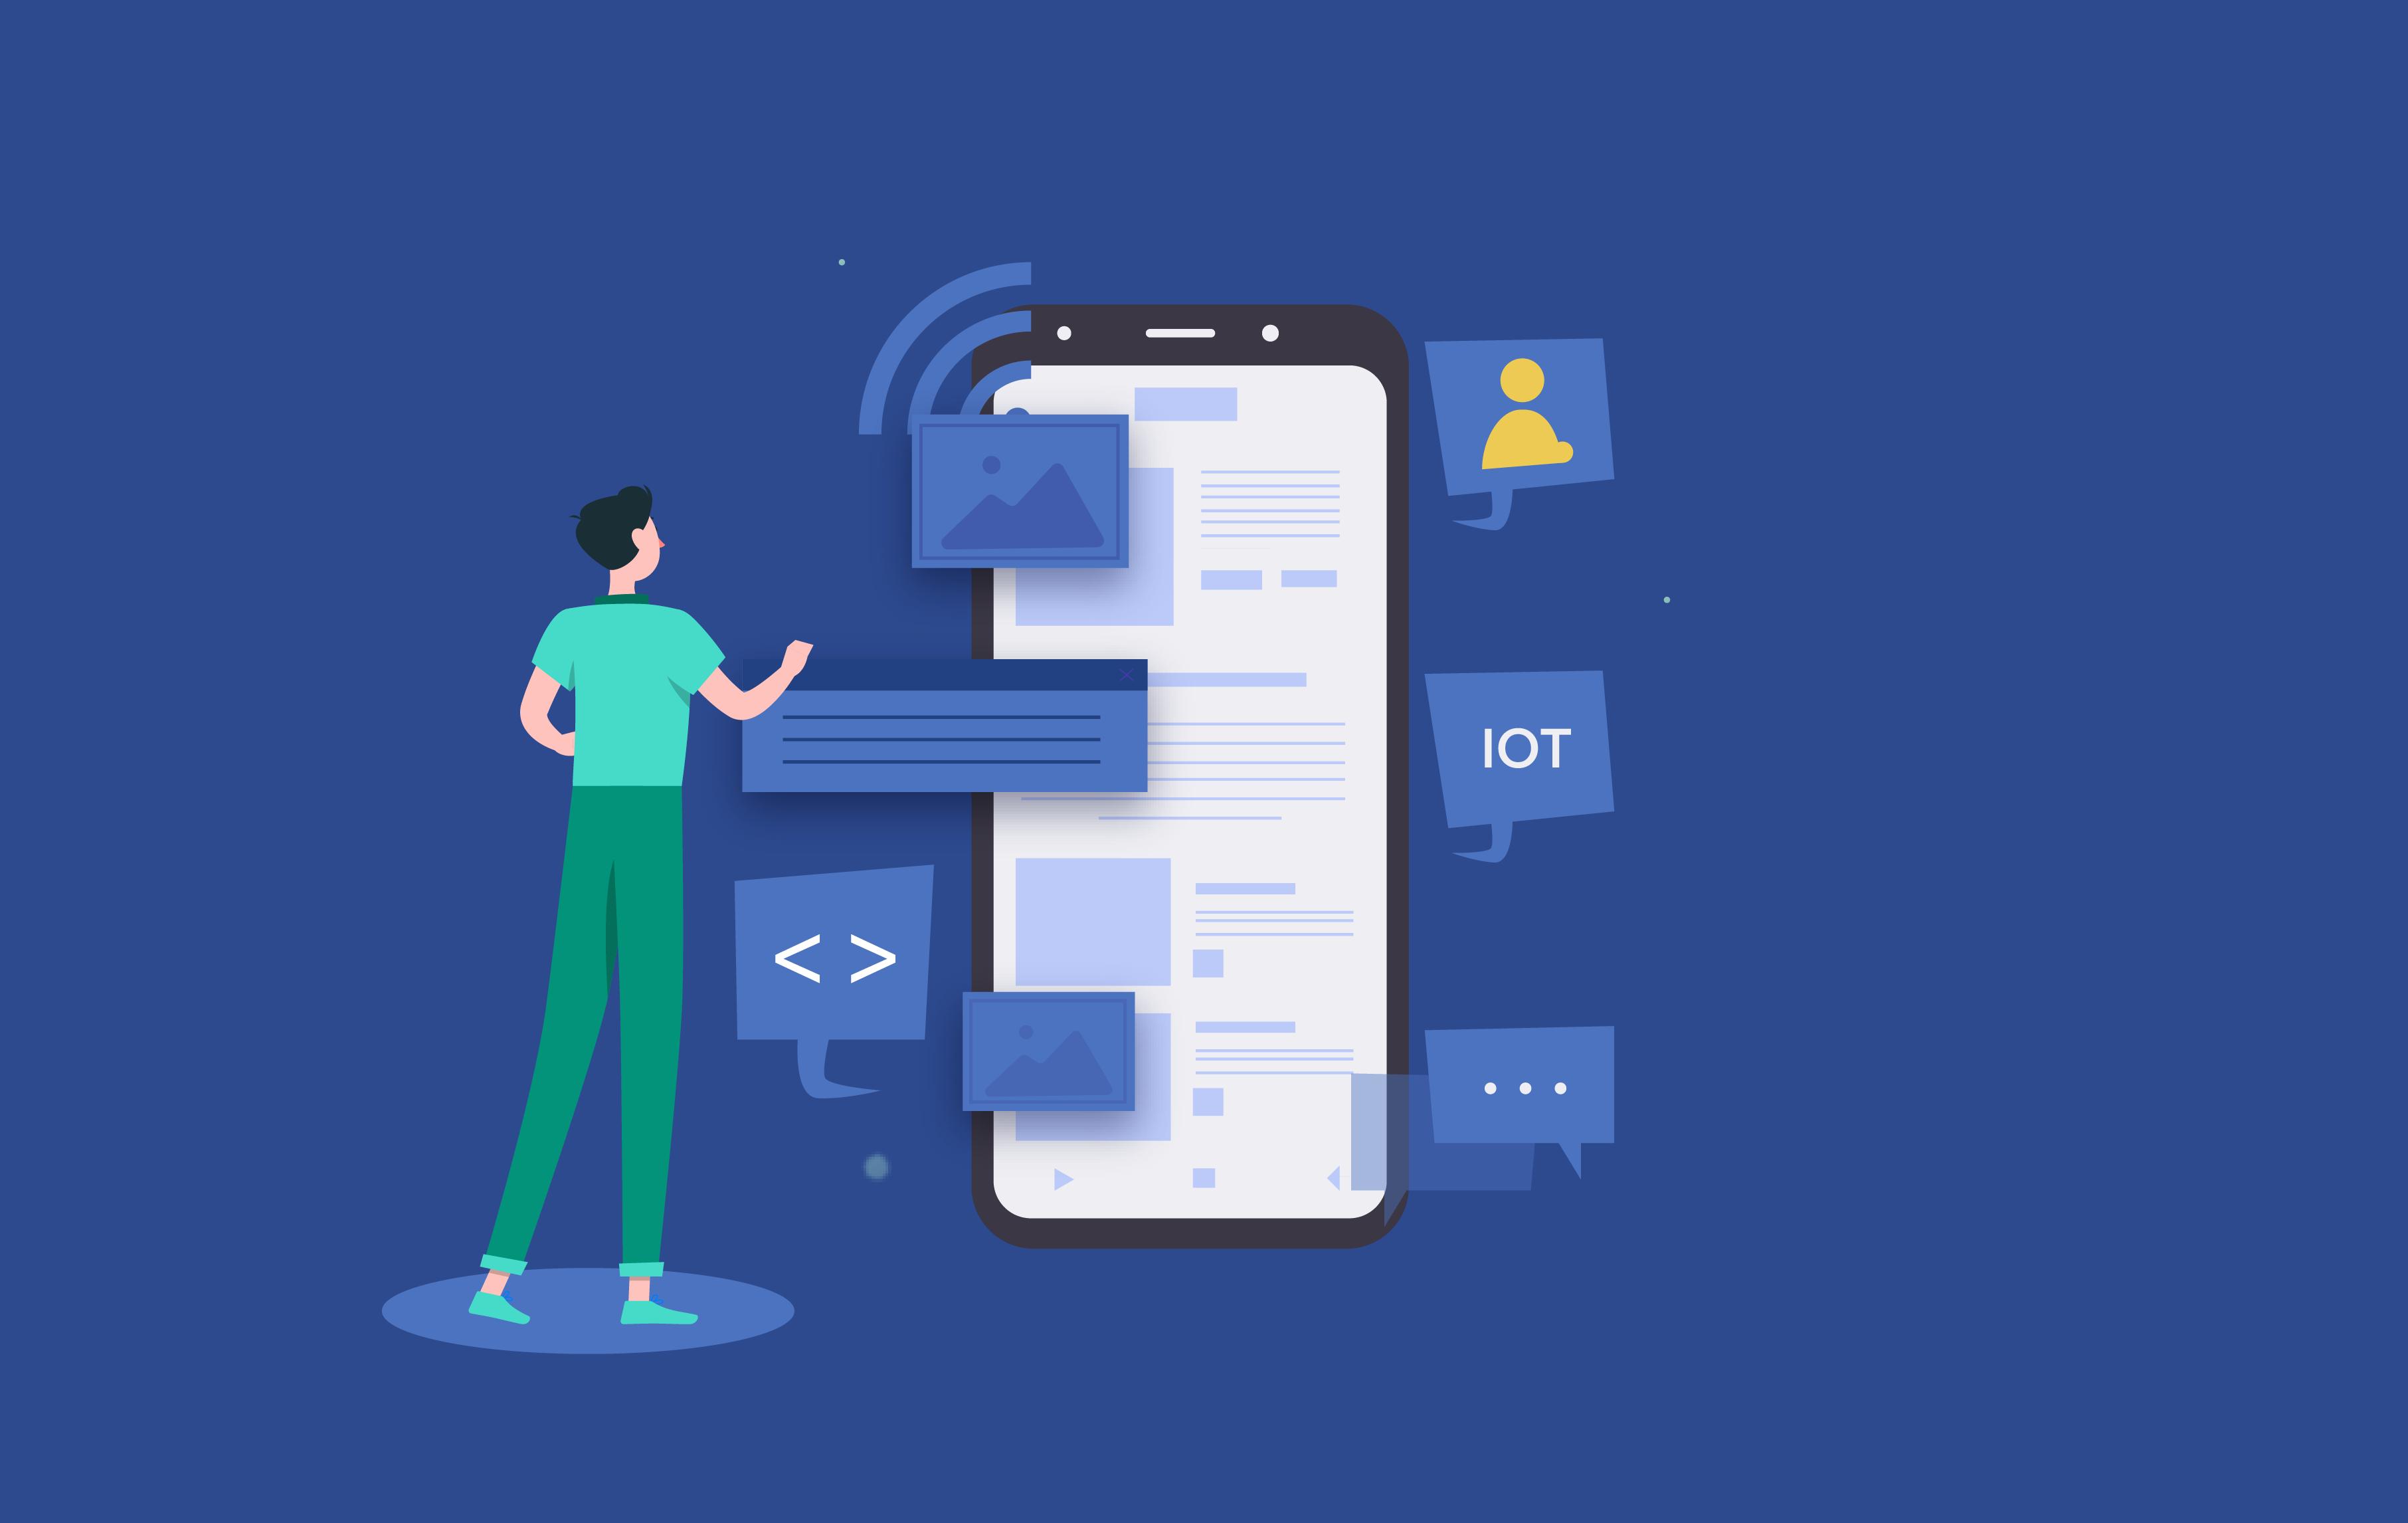 iot application development platform